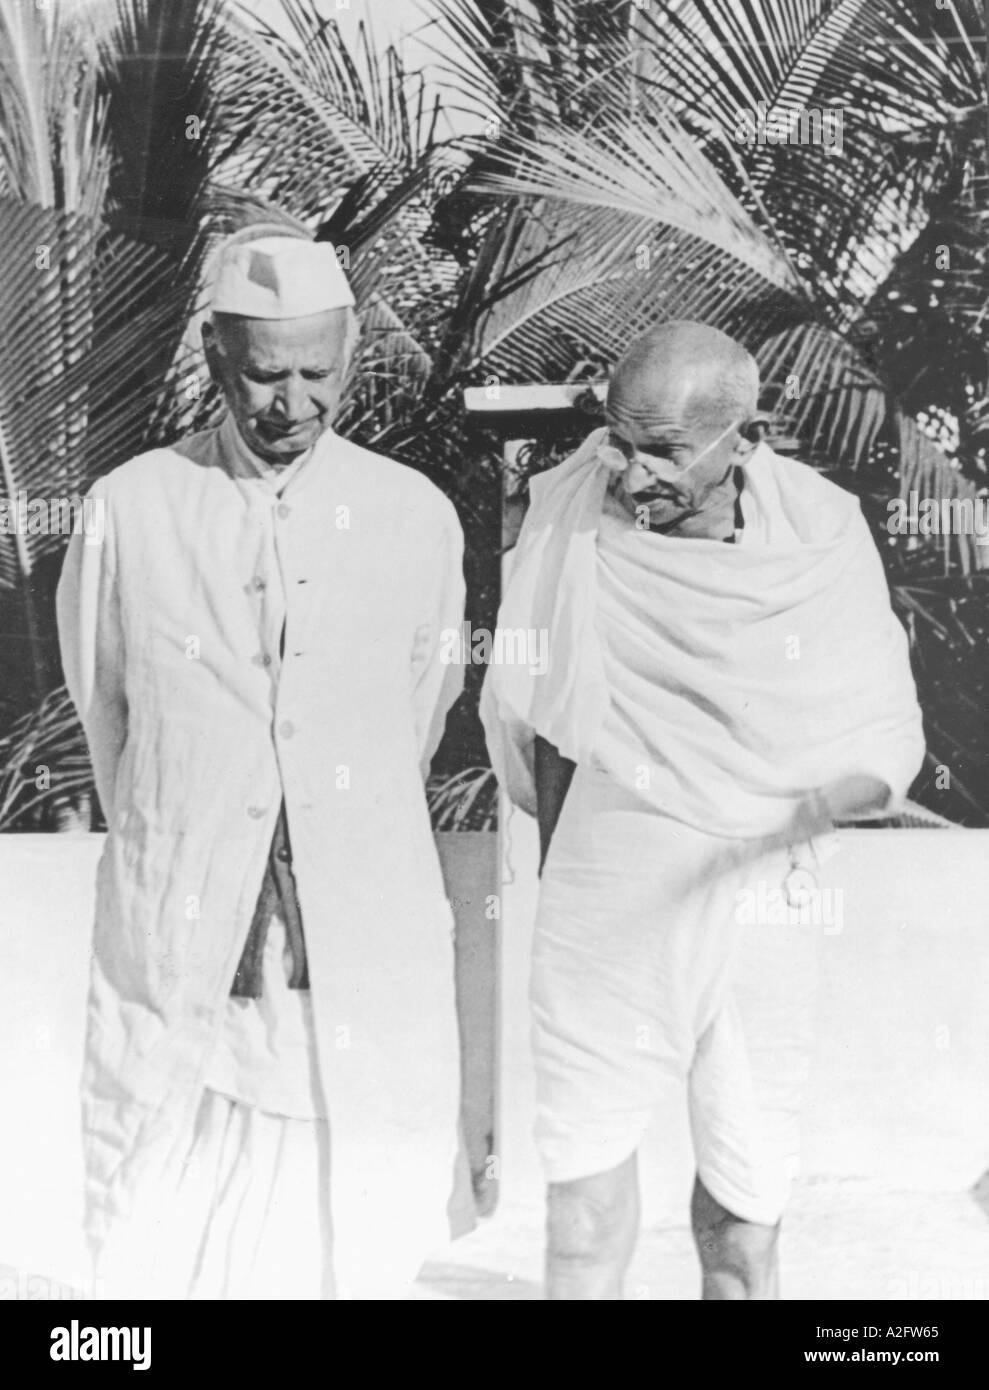 MKG33141 il Mahatma Gandhi con il leader Harijan Thakkar Bapa a Chennai Madras Tamilnadu India Gennaio 1946 Immagini Stock